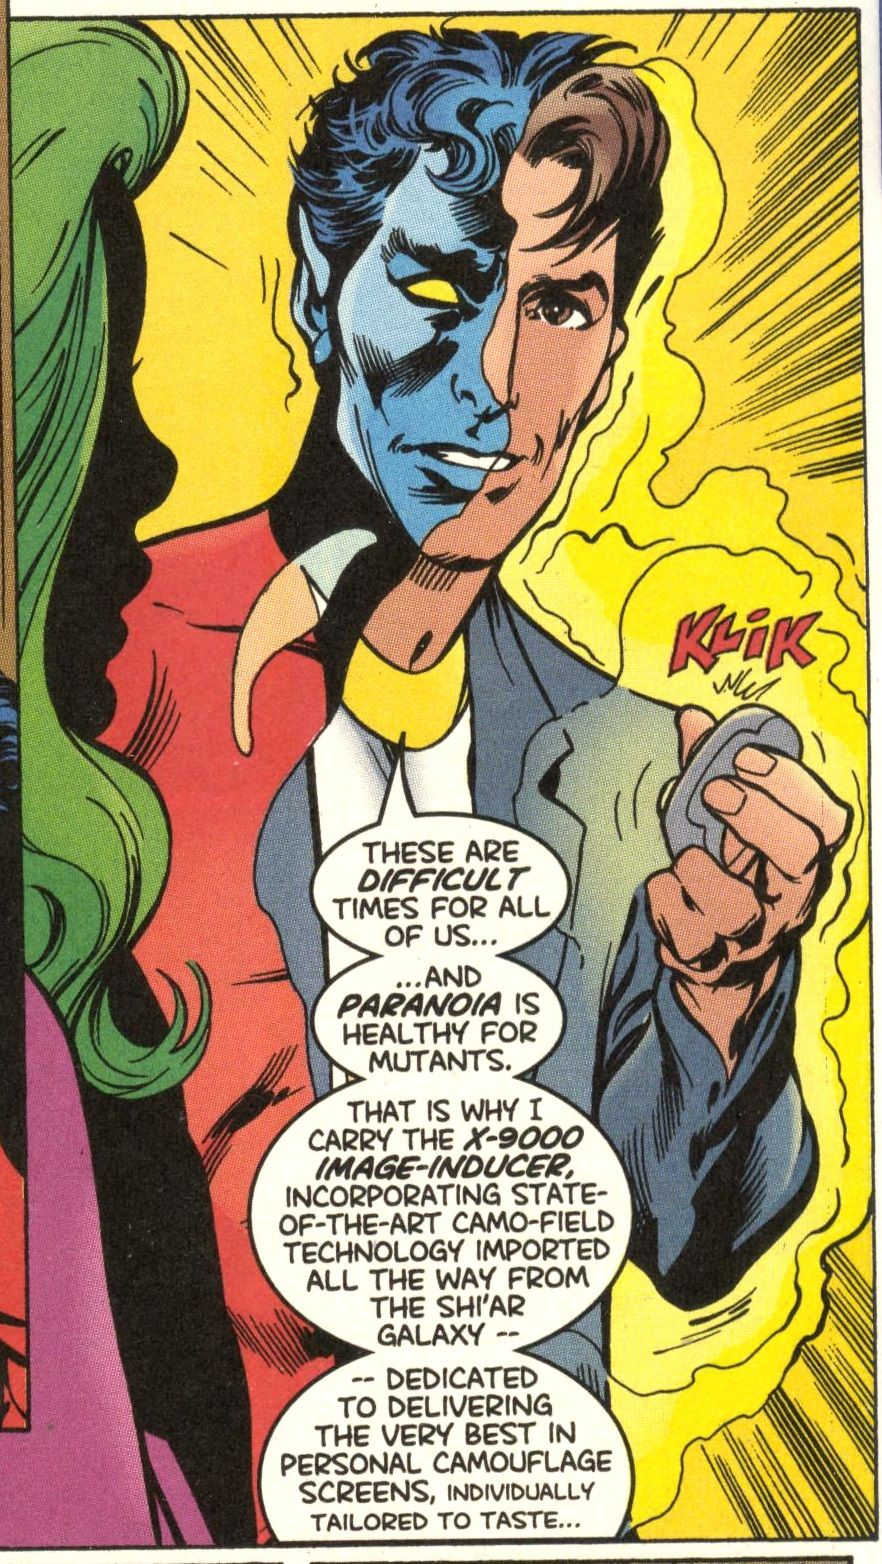 X 9000 Image Inducer From X Men 94 Nov 1999 Nightcrawler Superhero Comic Comic Book Panels